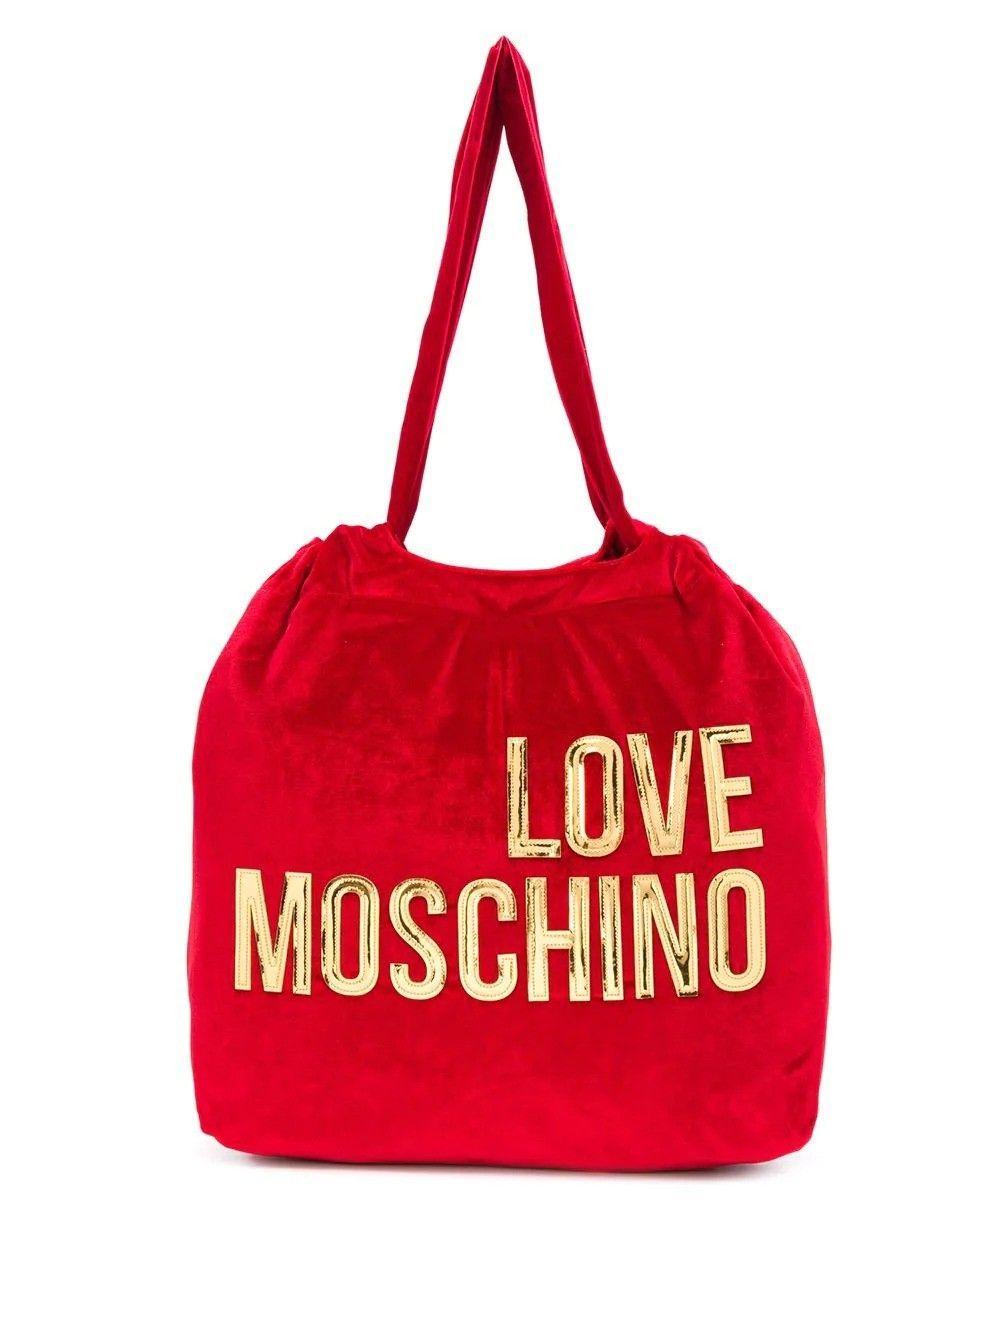 LOVE MOSCHINO WOMEN'S JC4121PP18LZ0500 RED VELVET TOTE